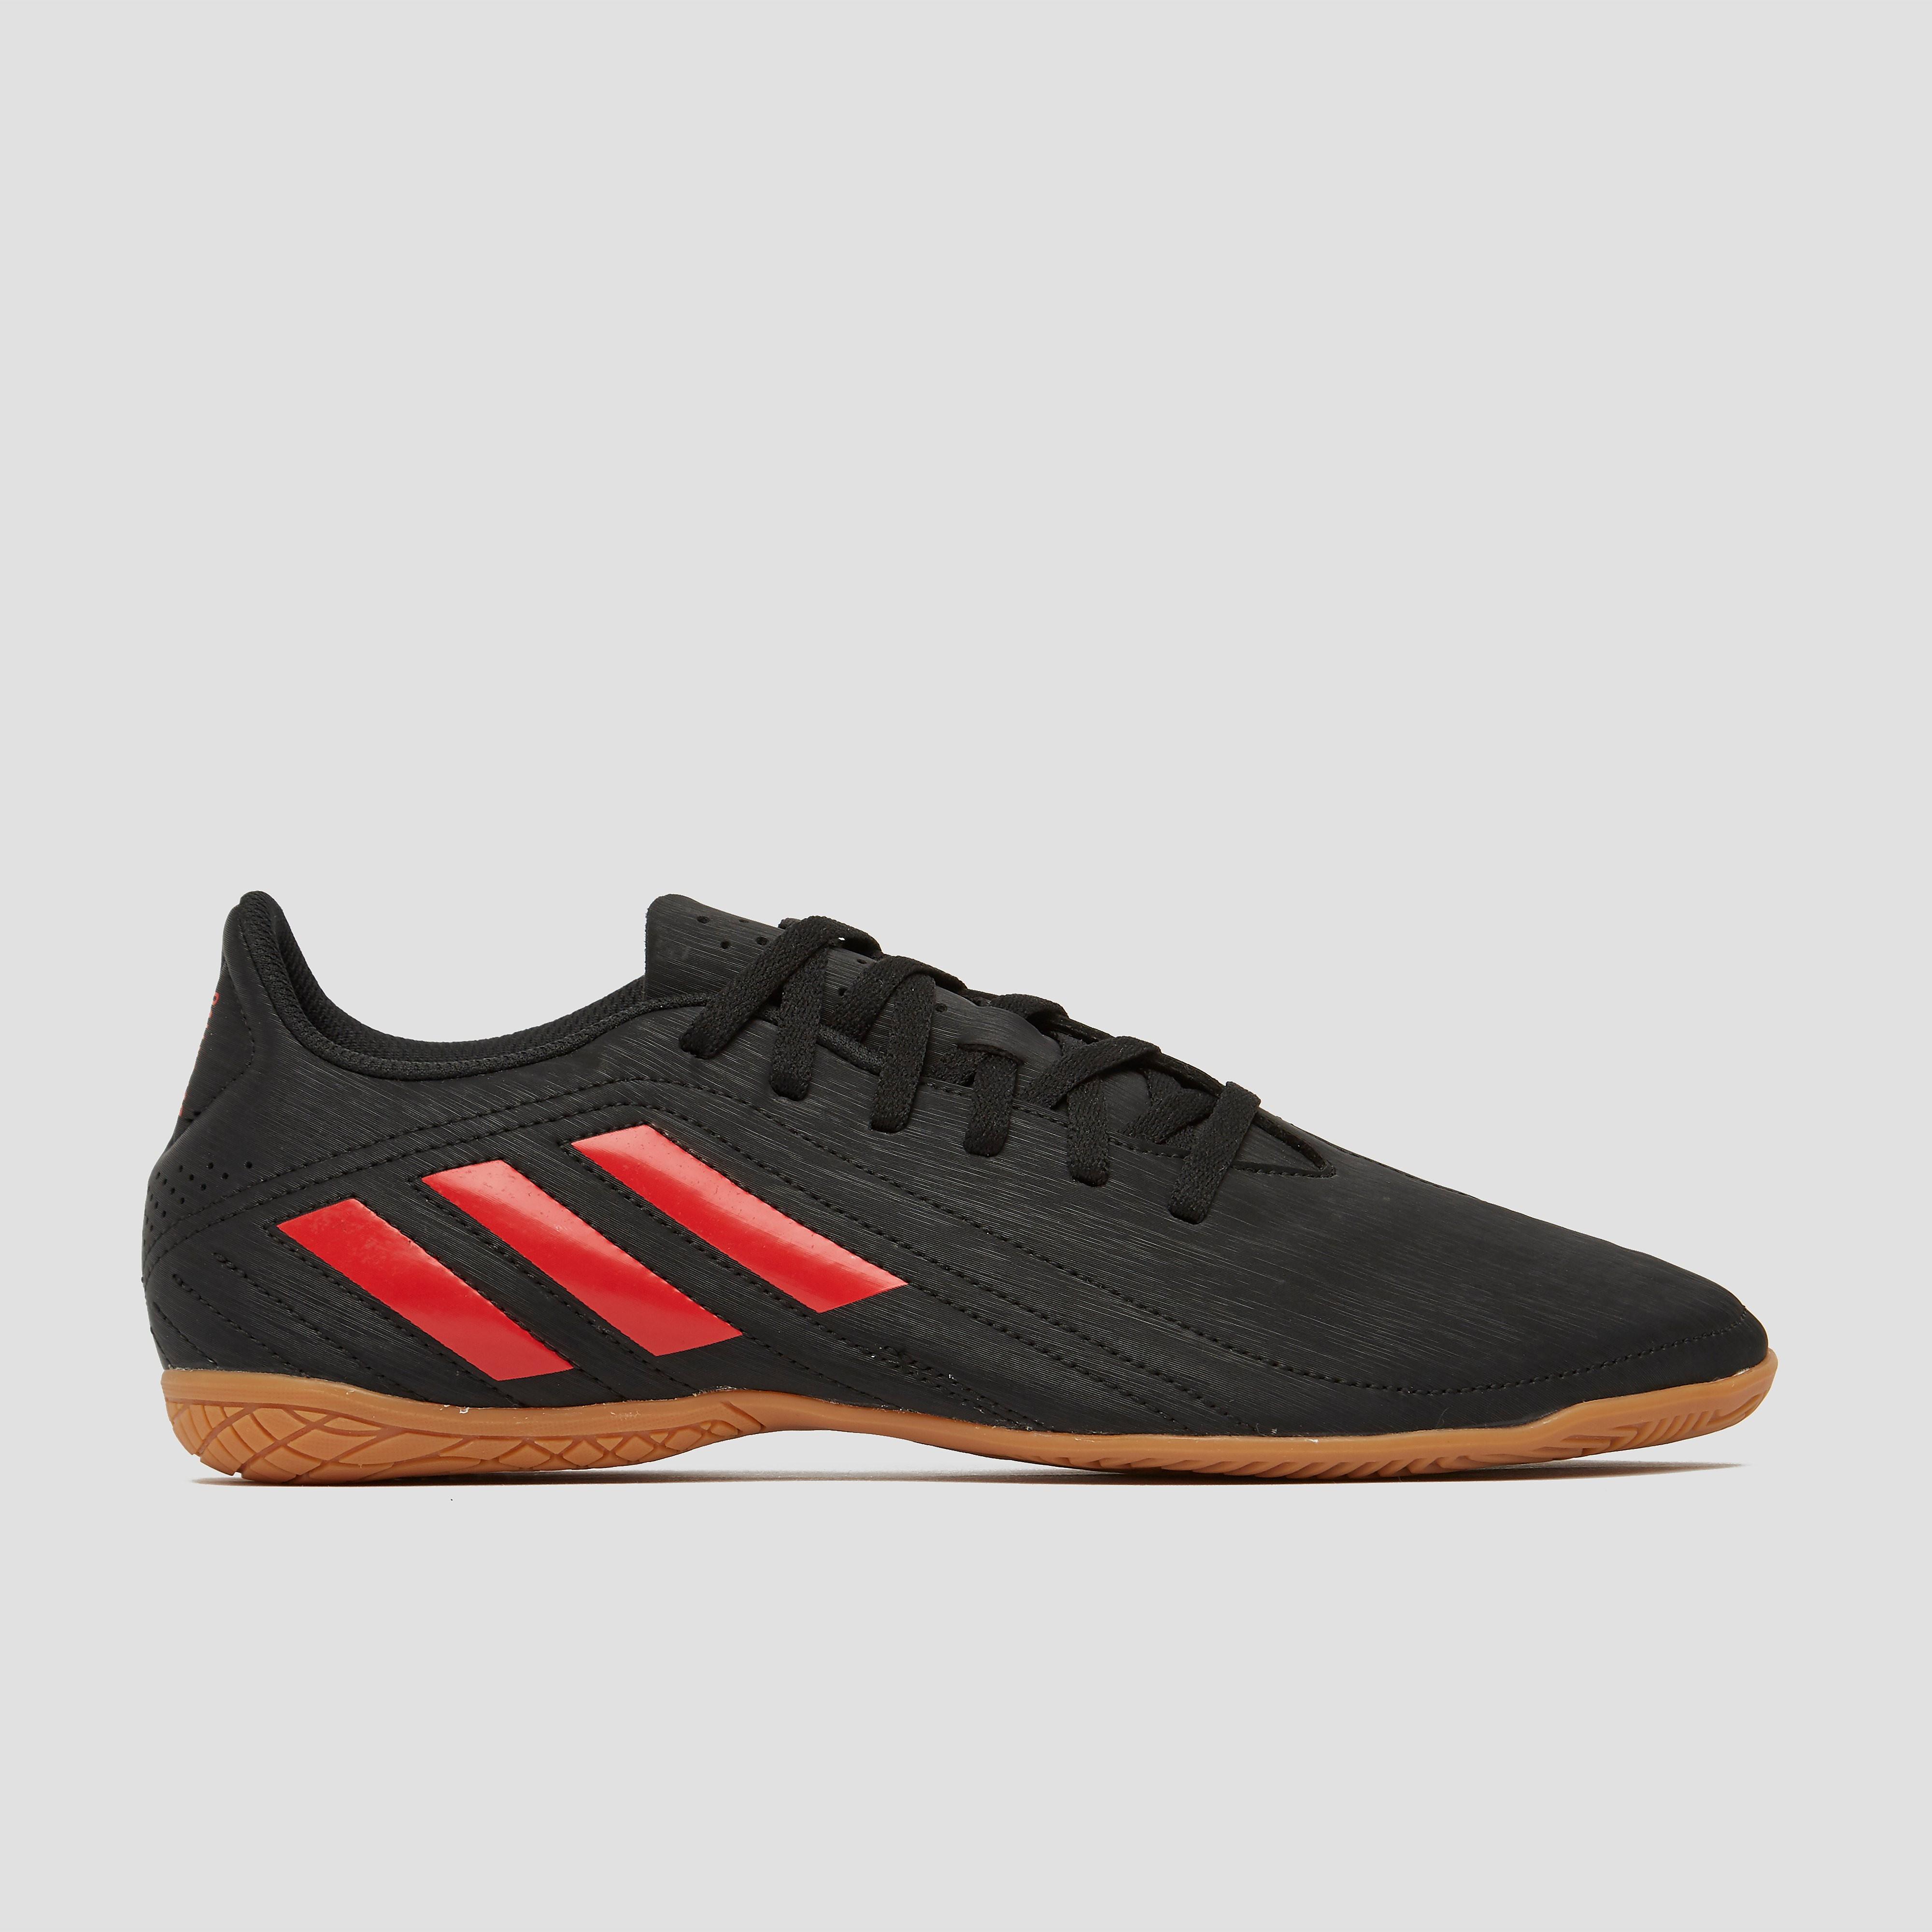 adidas Conquisto iii in voetbalschoenen zwart-rood Dames